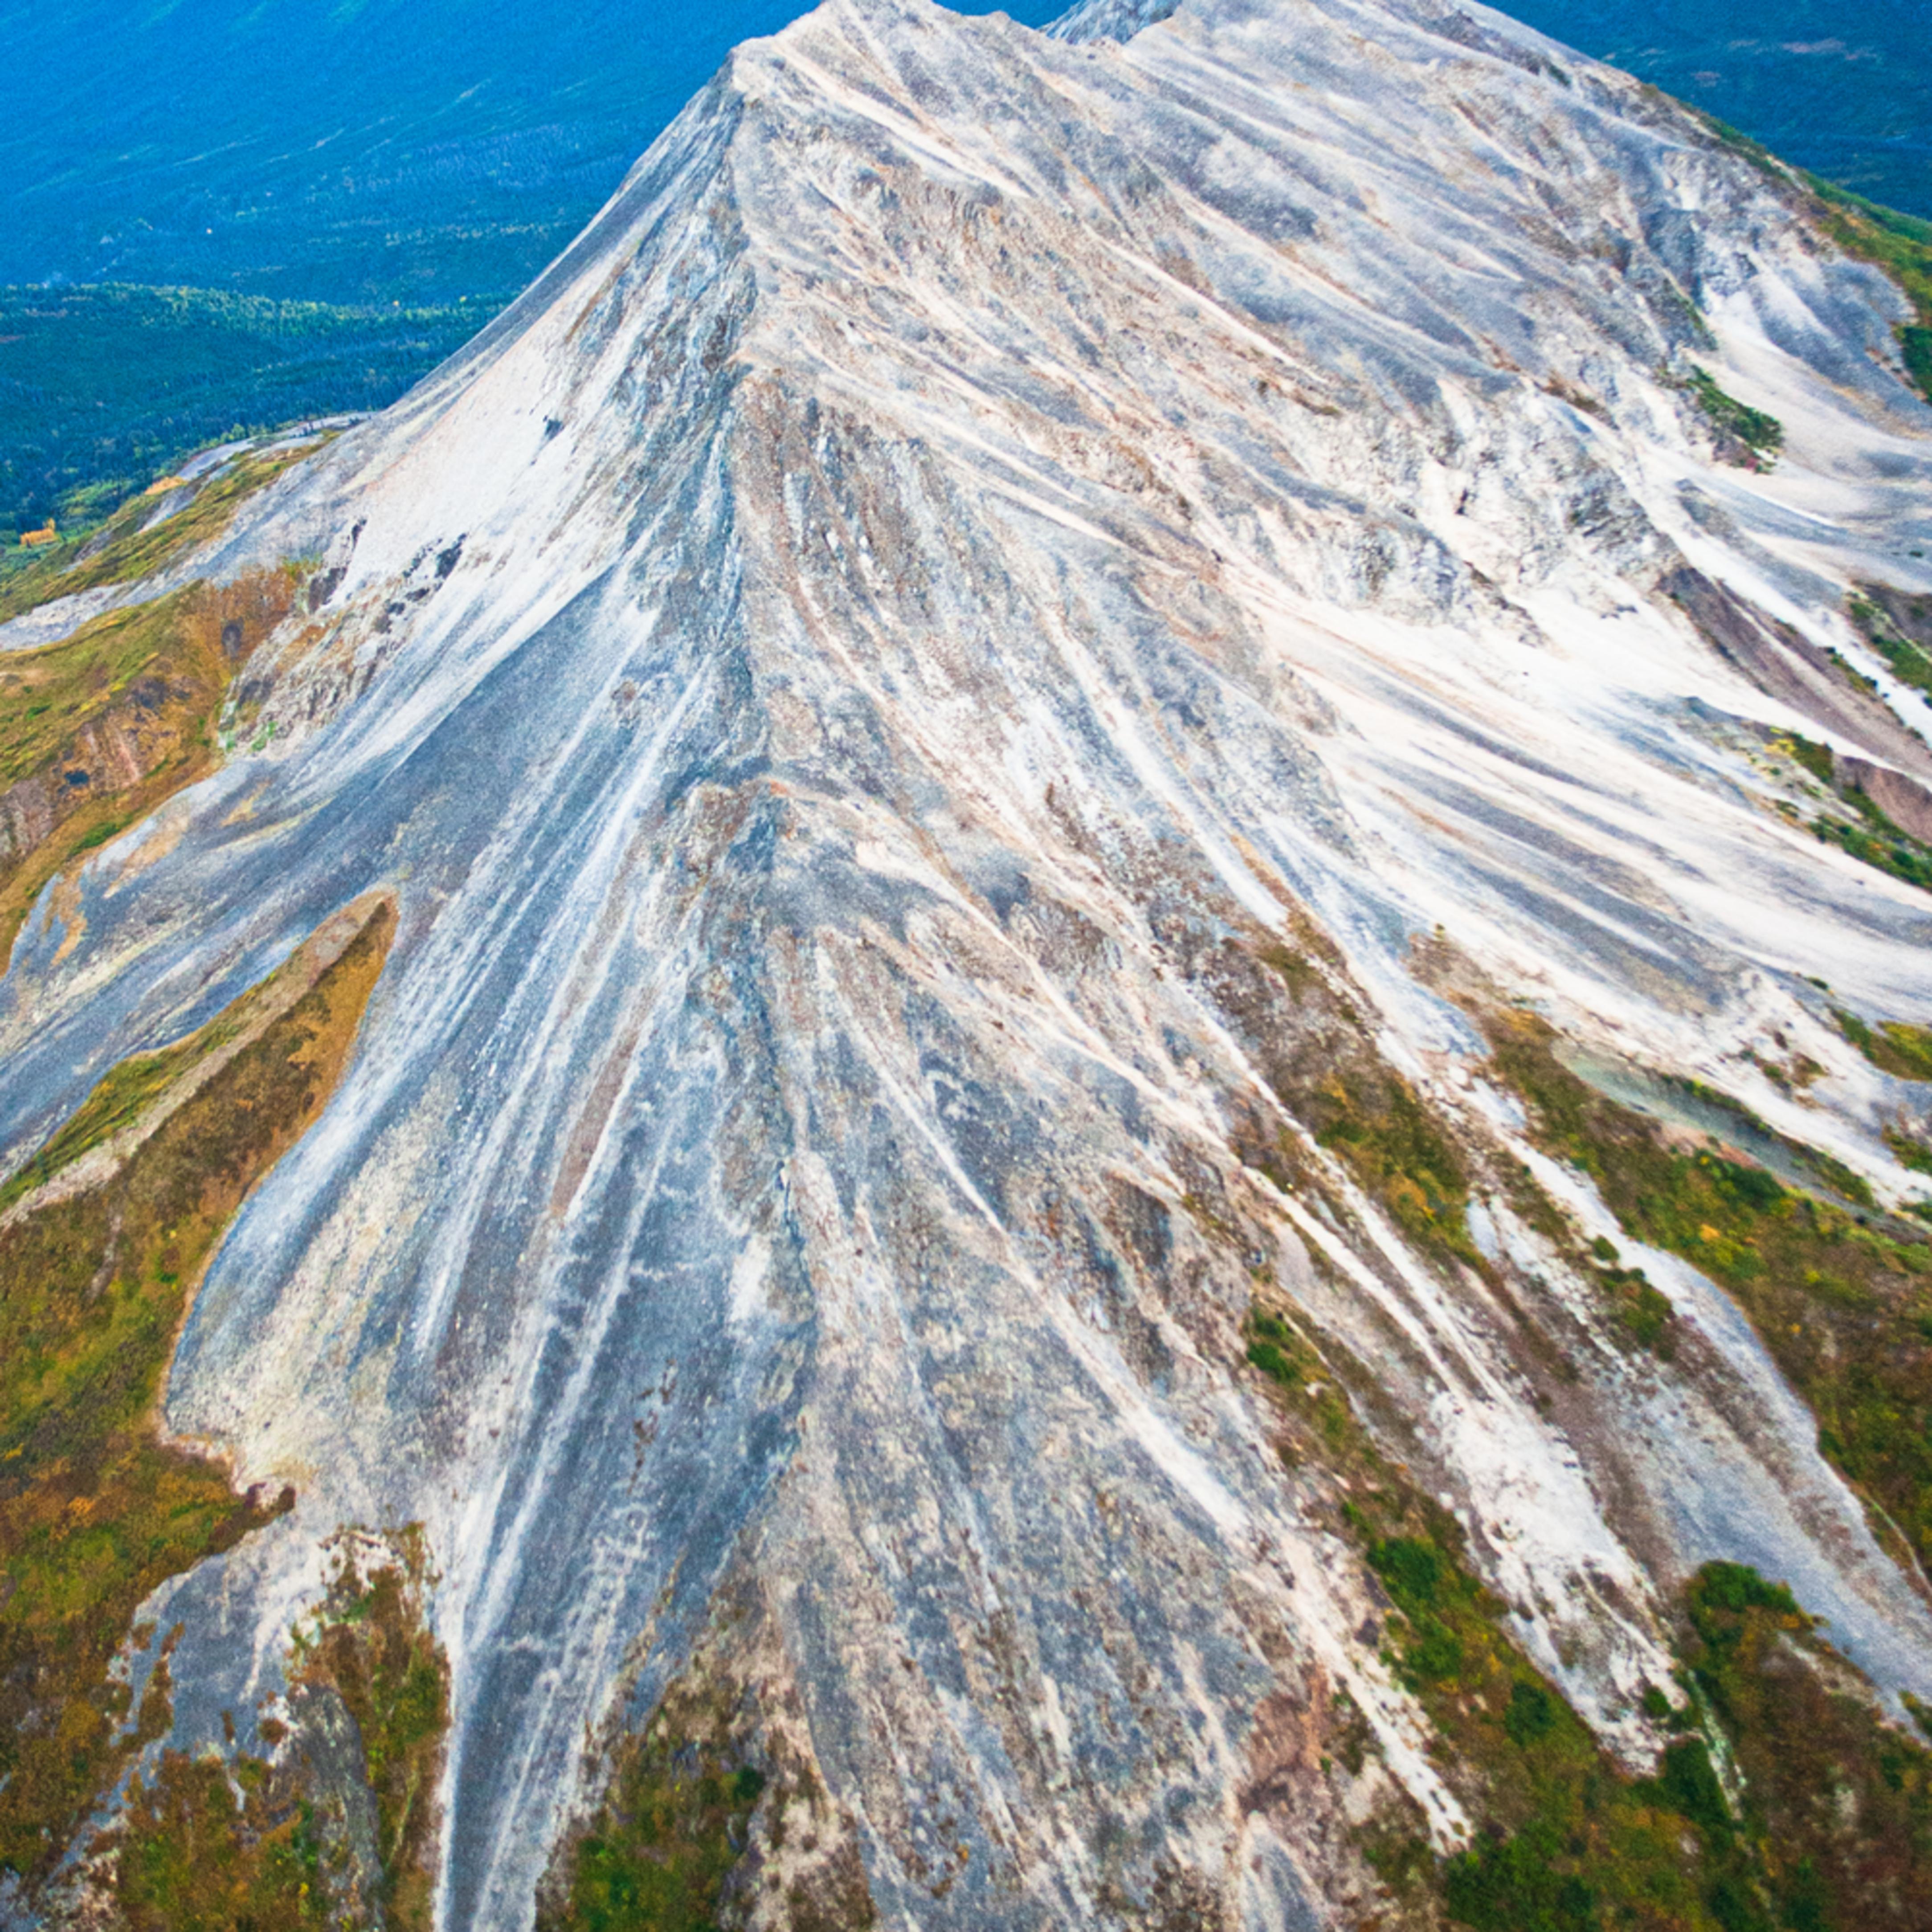 Dsc 4288 mountain spine aerial alaska aerial cirque at sunset mcrgod